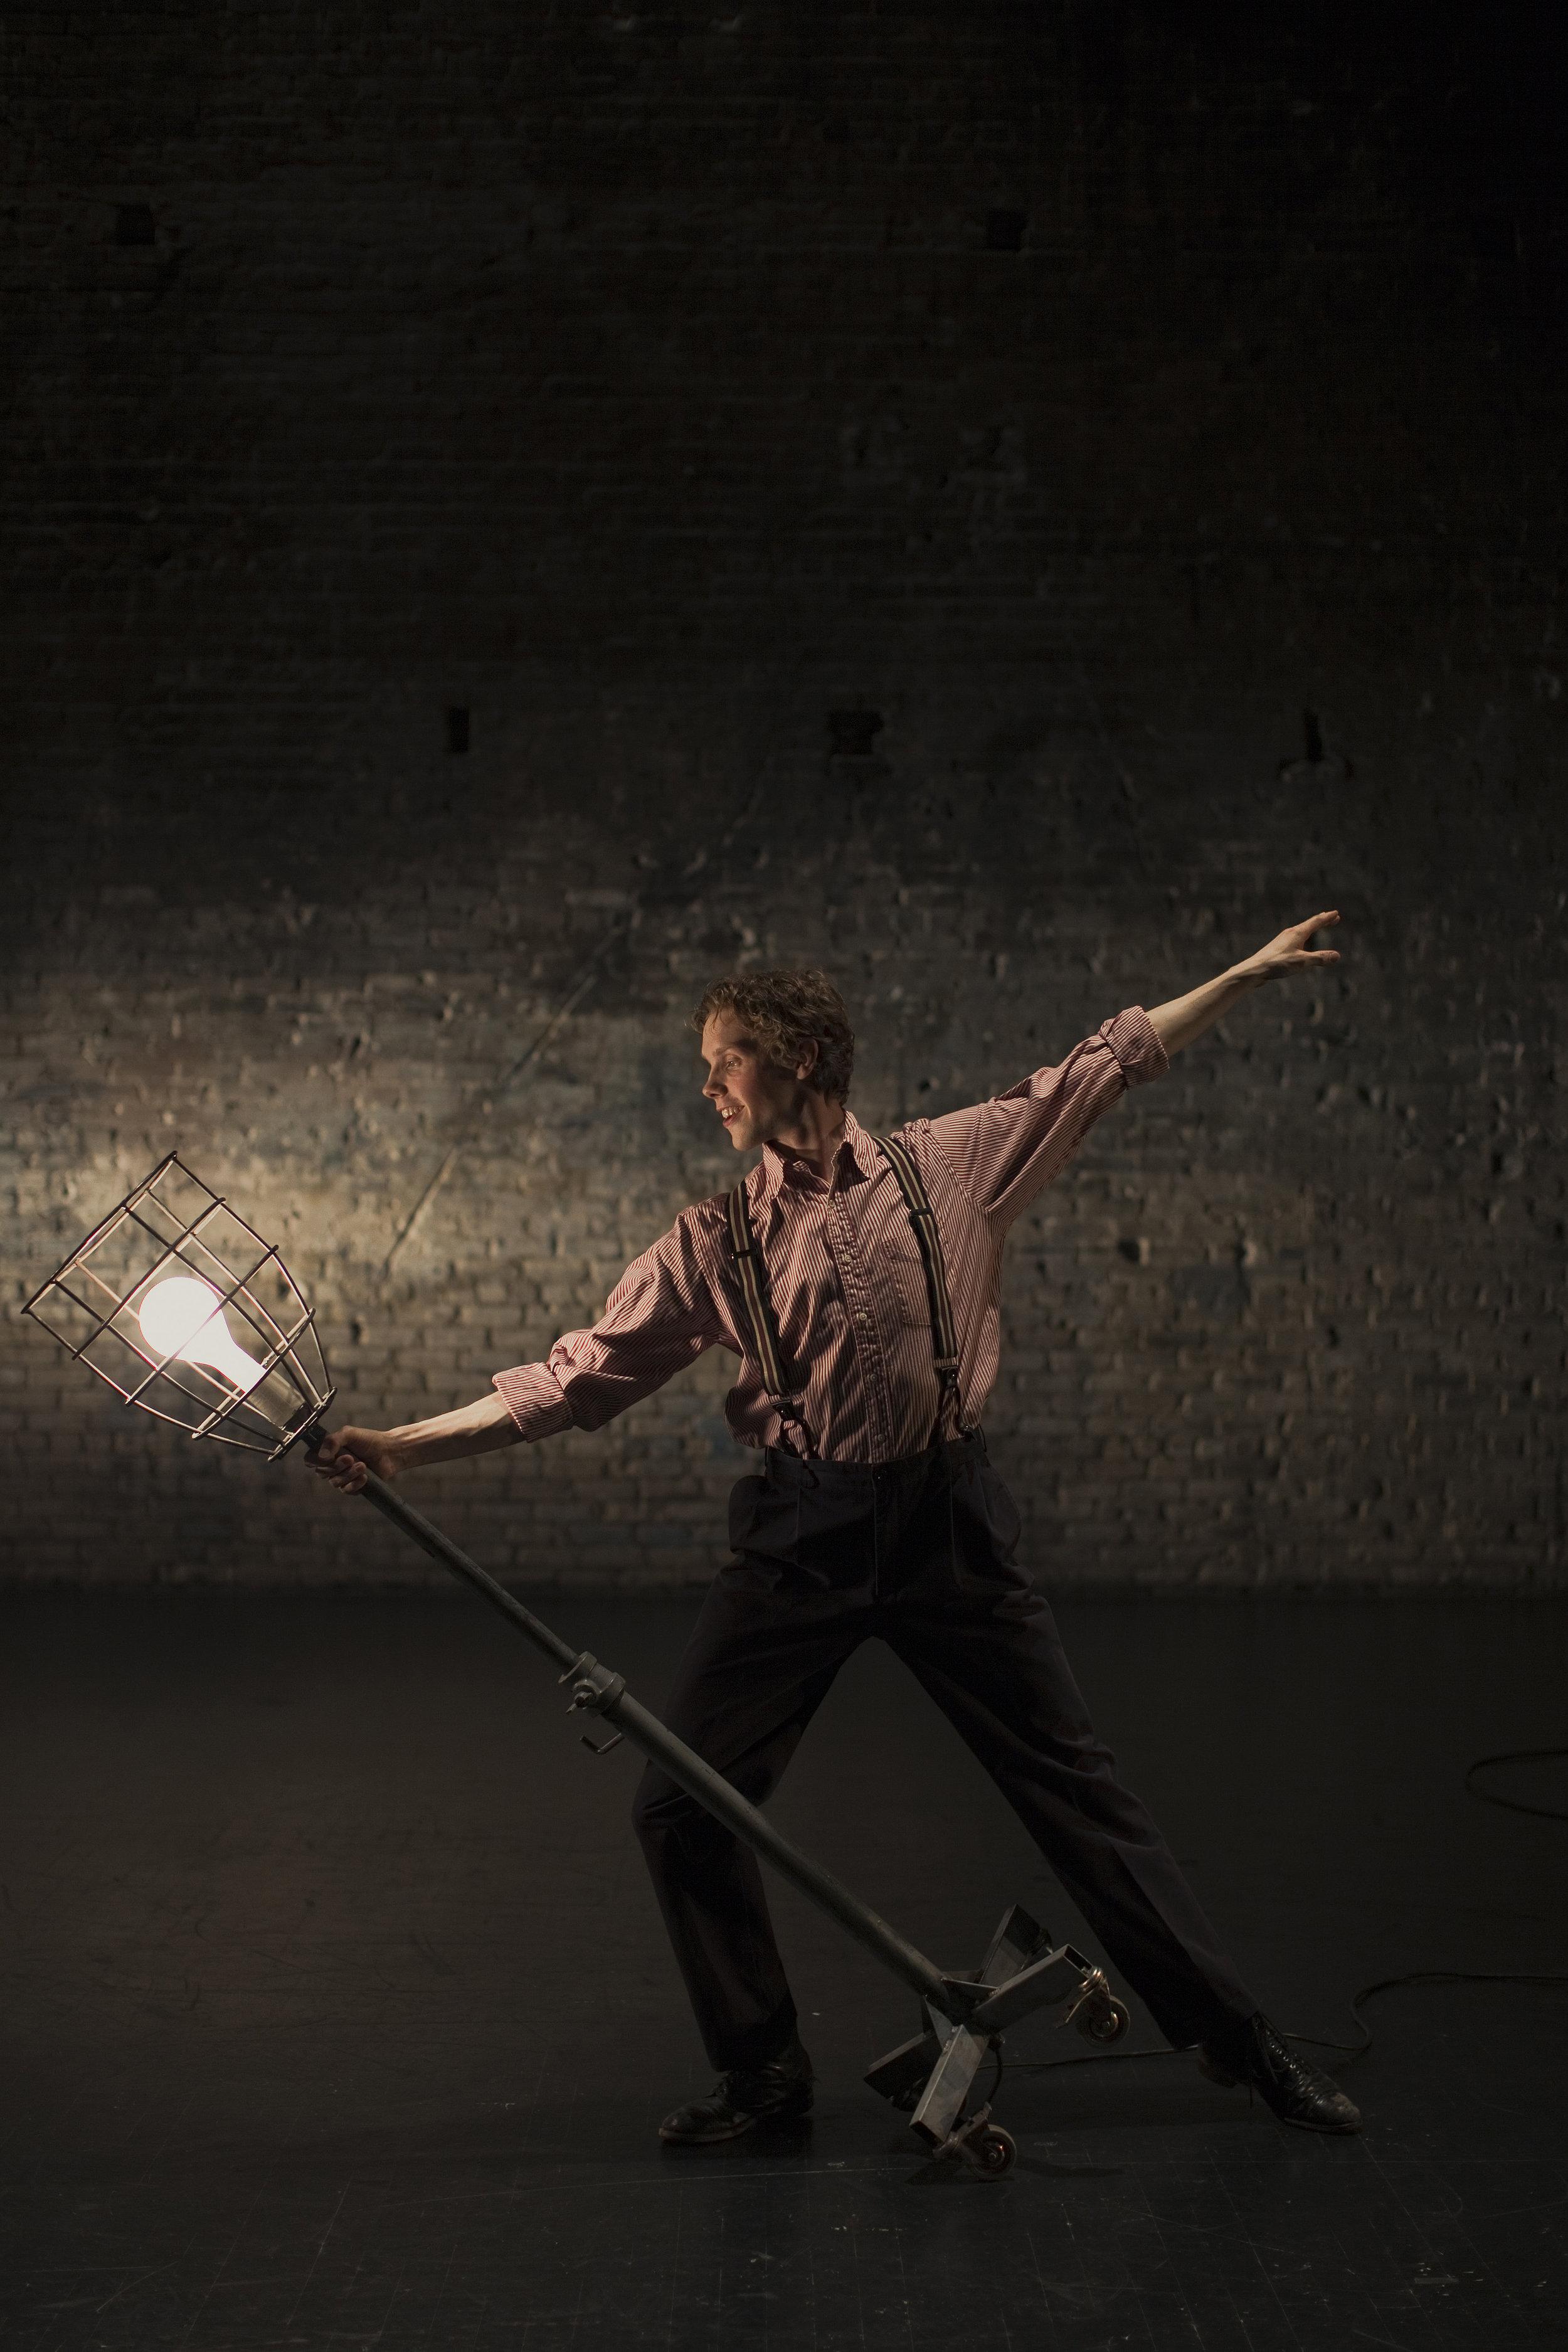 Tyler Michaels as Tulsa, Photo by Joe Dickie